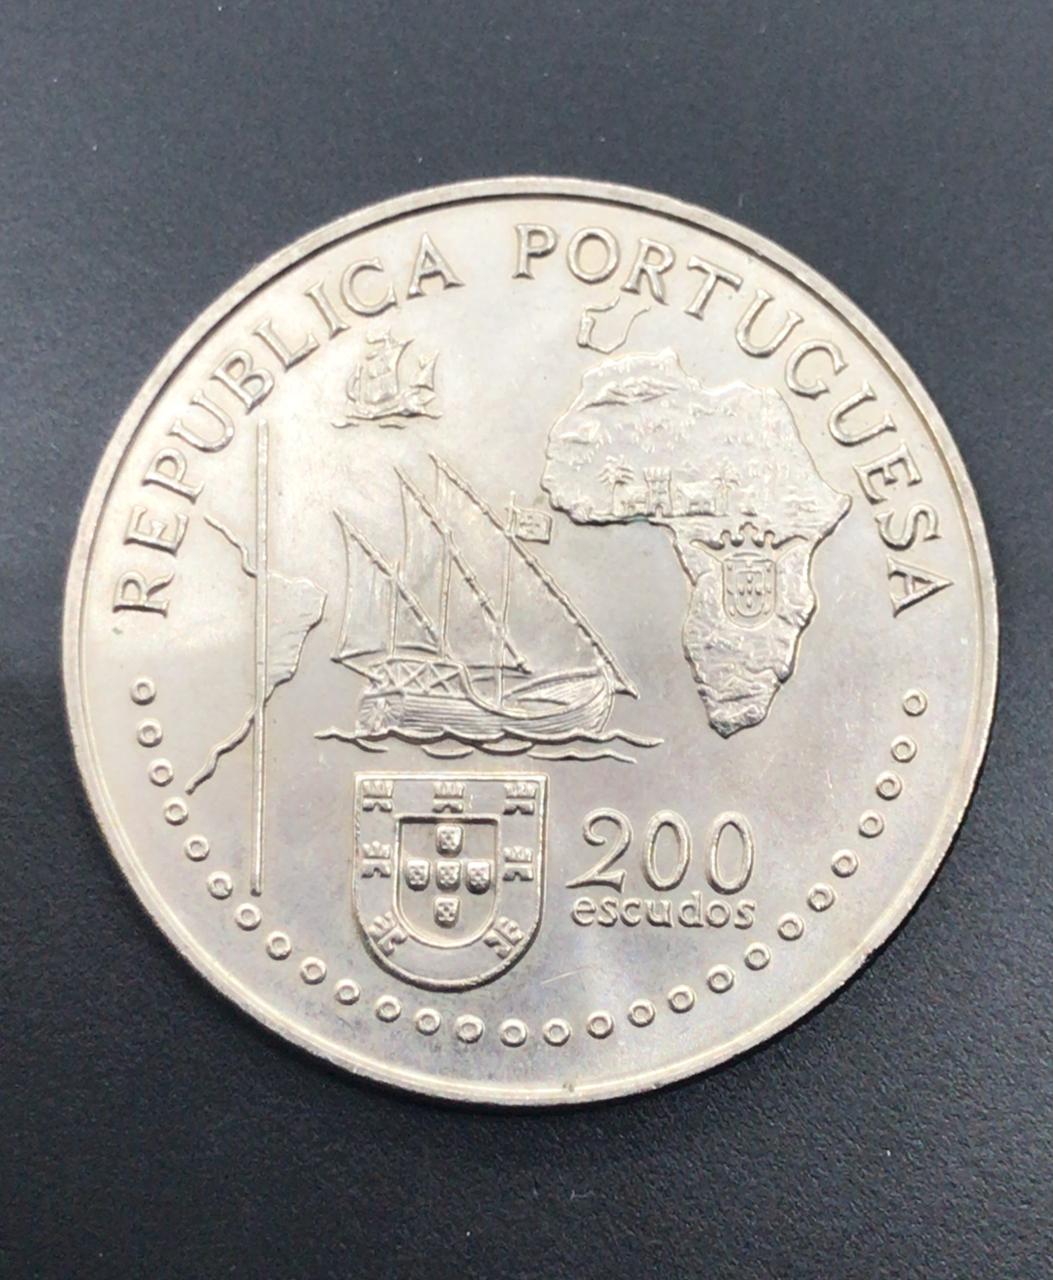 Moeda de Portugal 200 Escudos - Tratado de Tordesilhas 1494-1994